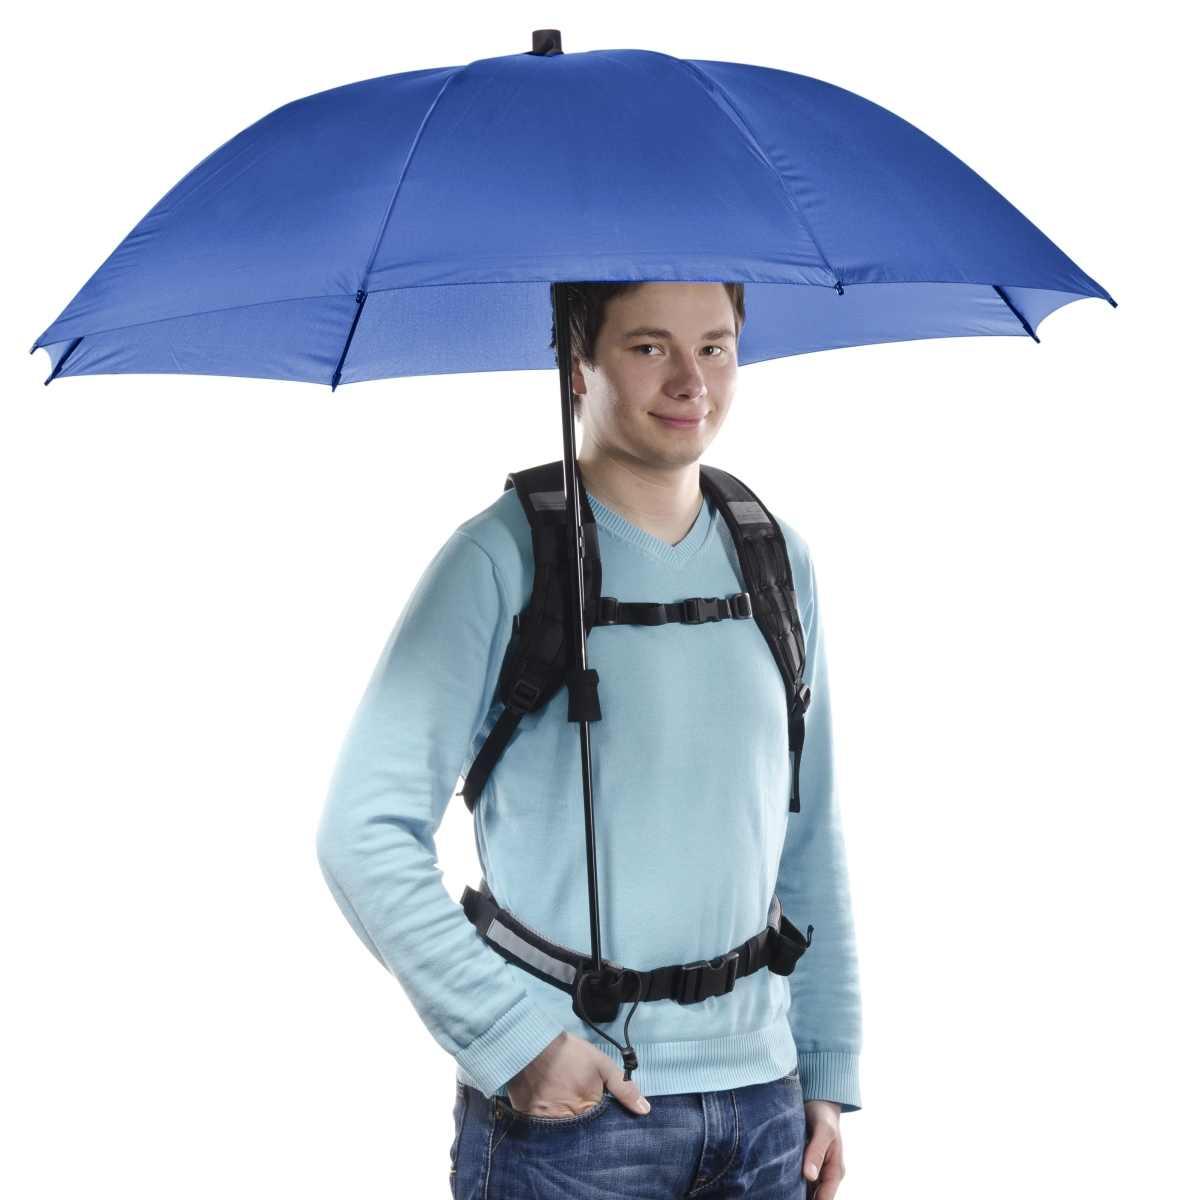 Swing handsfree Umbrella navy w. Carrier System